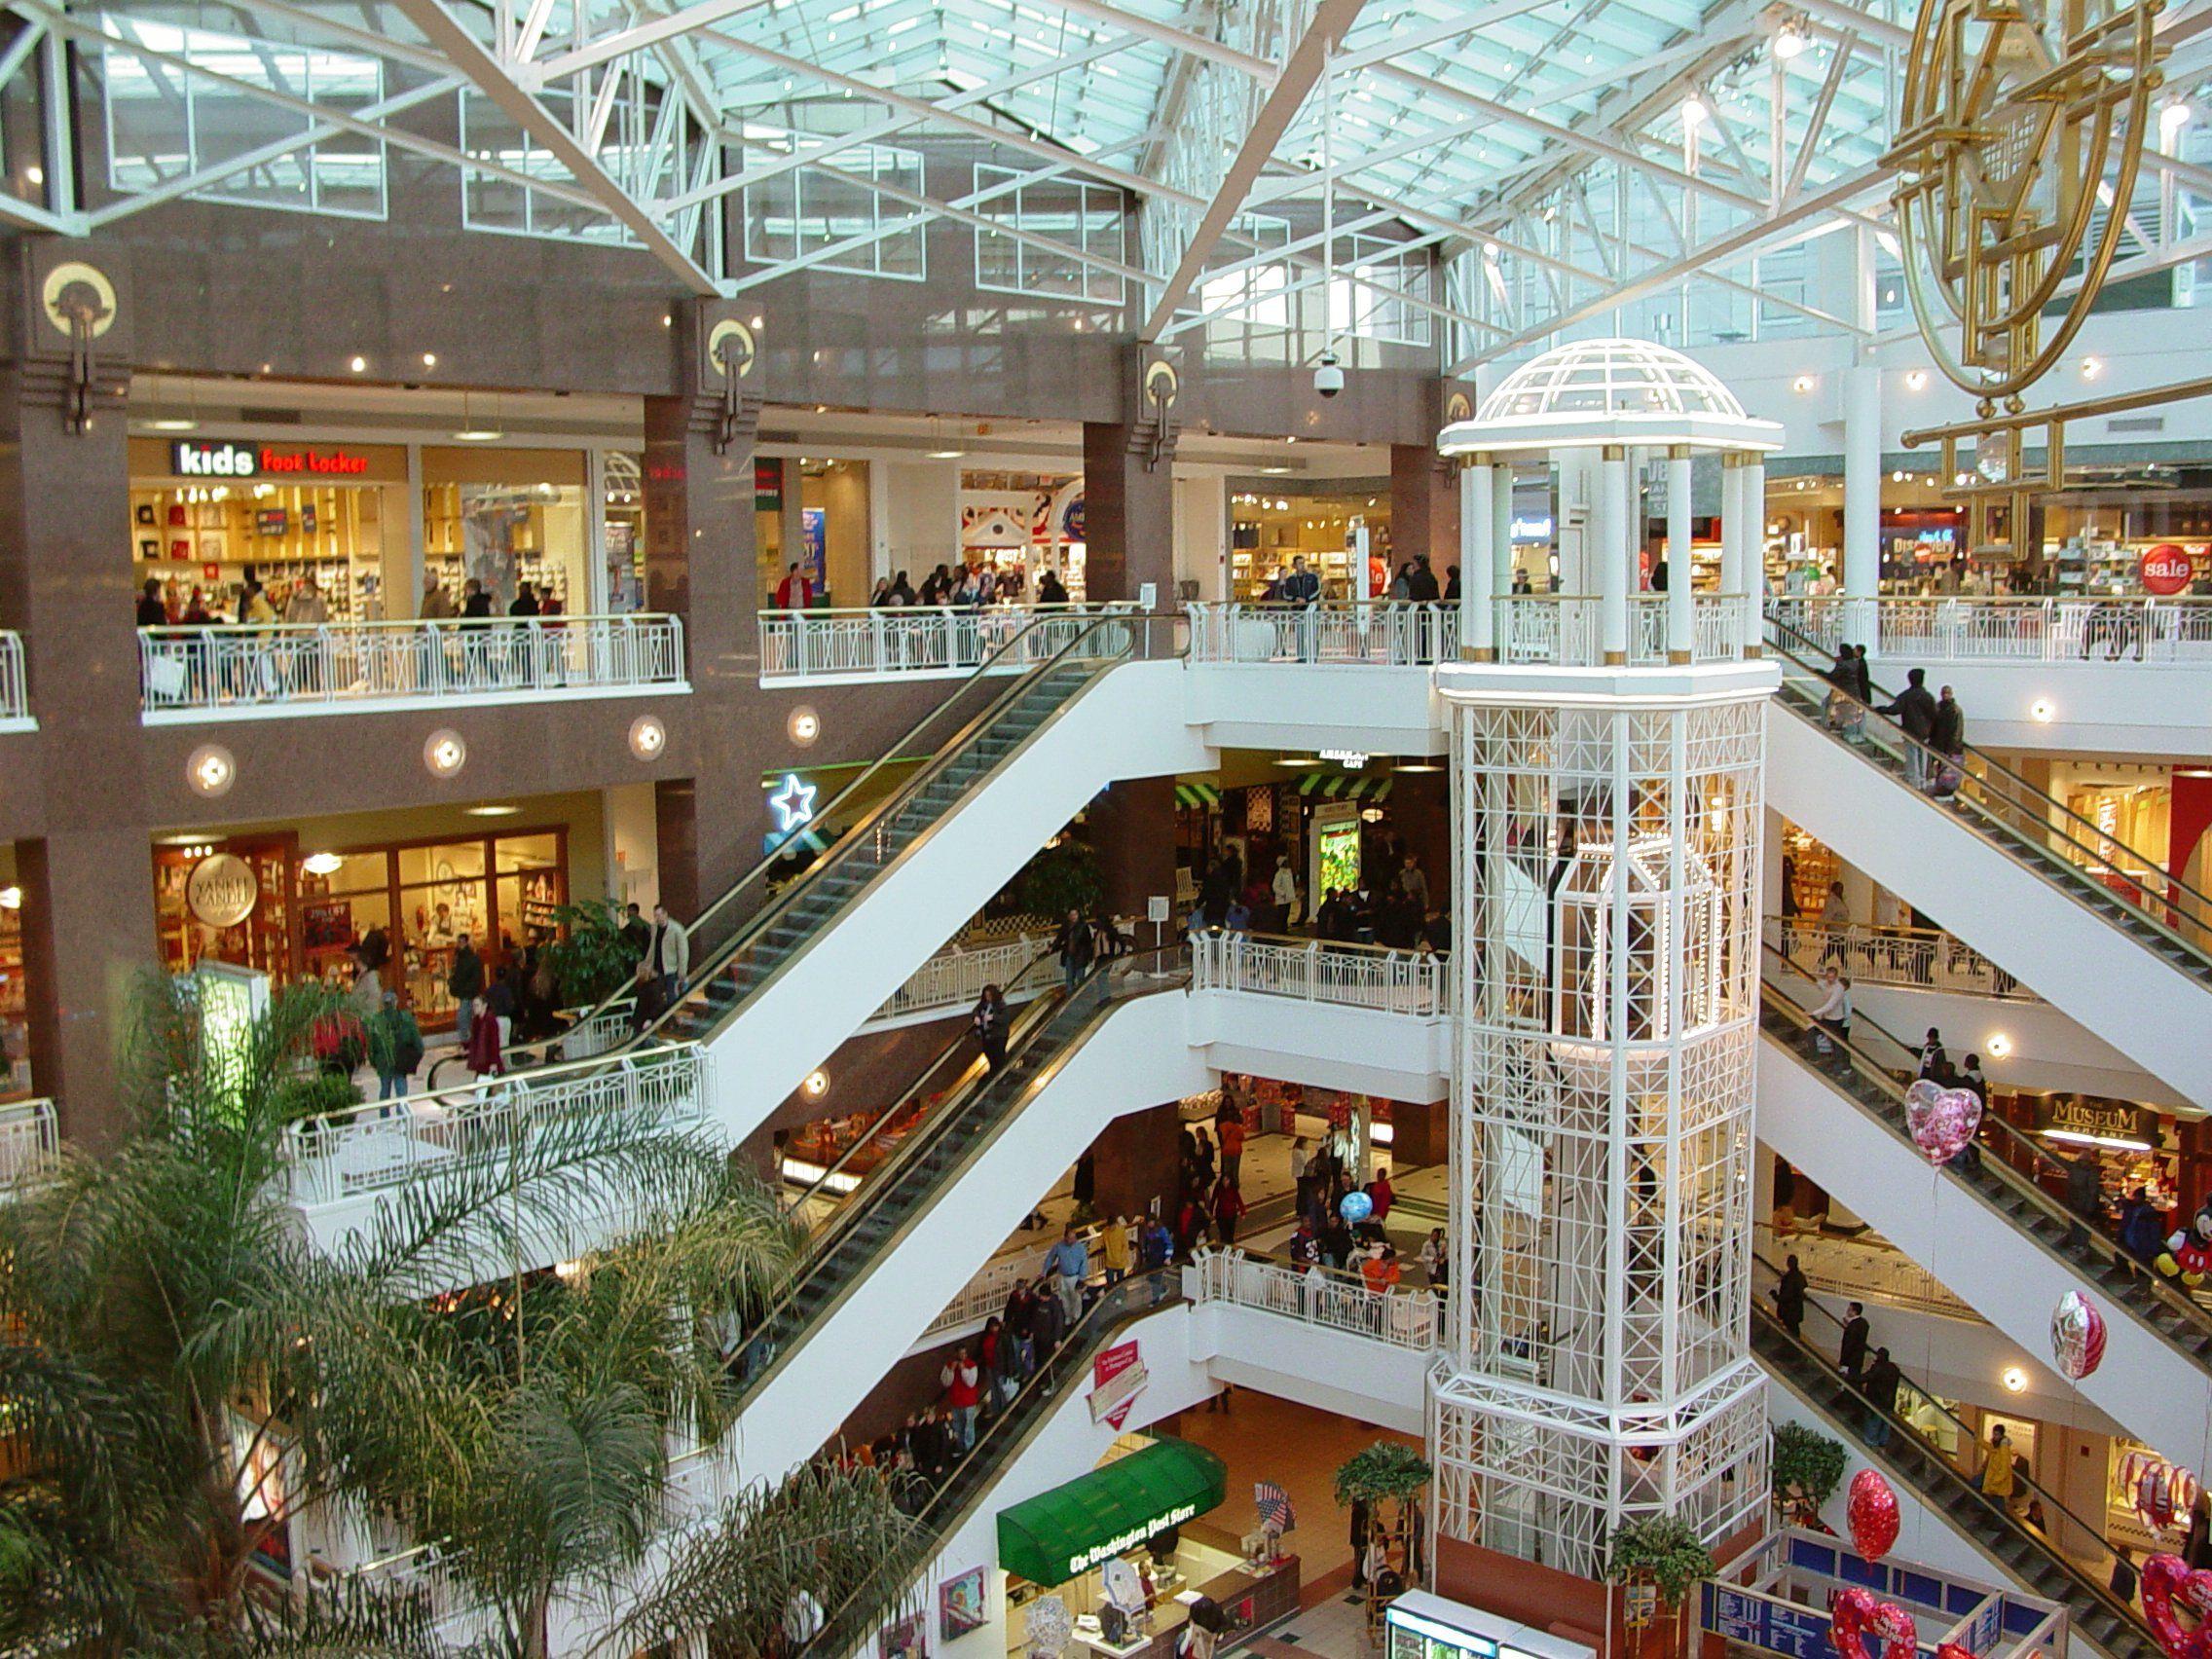 Top 10 Largest Malls in the U.S. Mall of america, Dubai